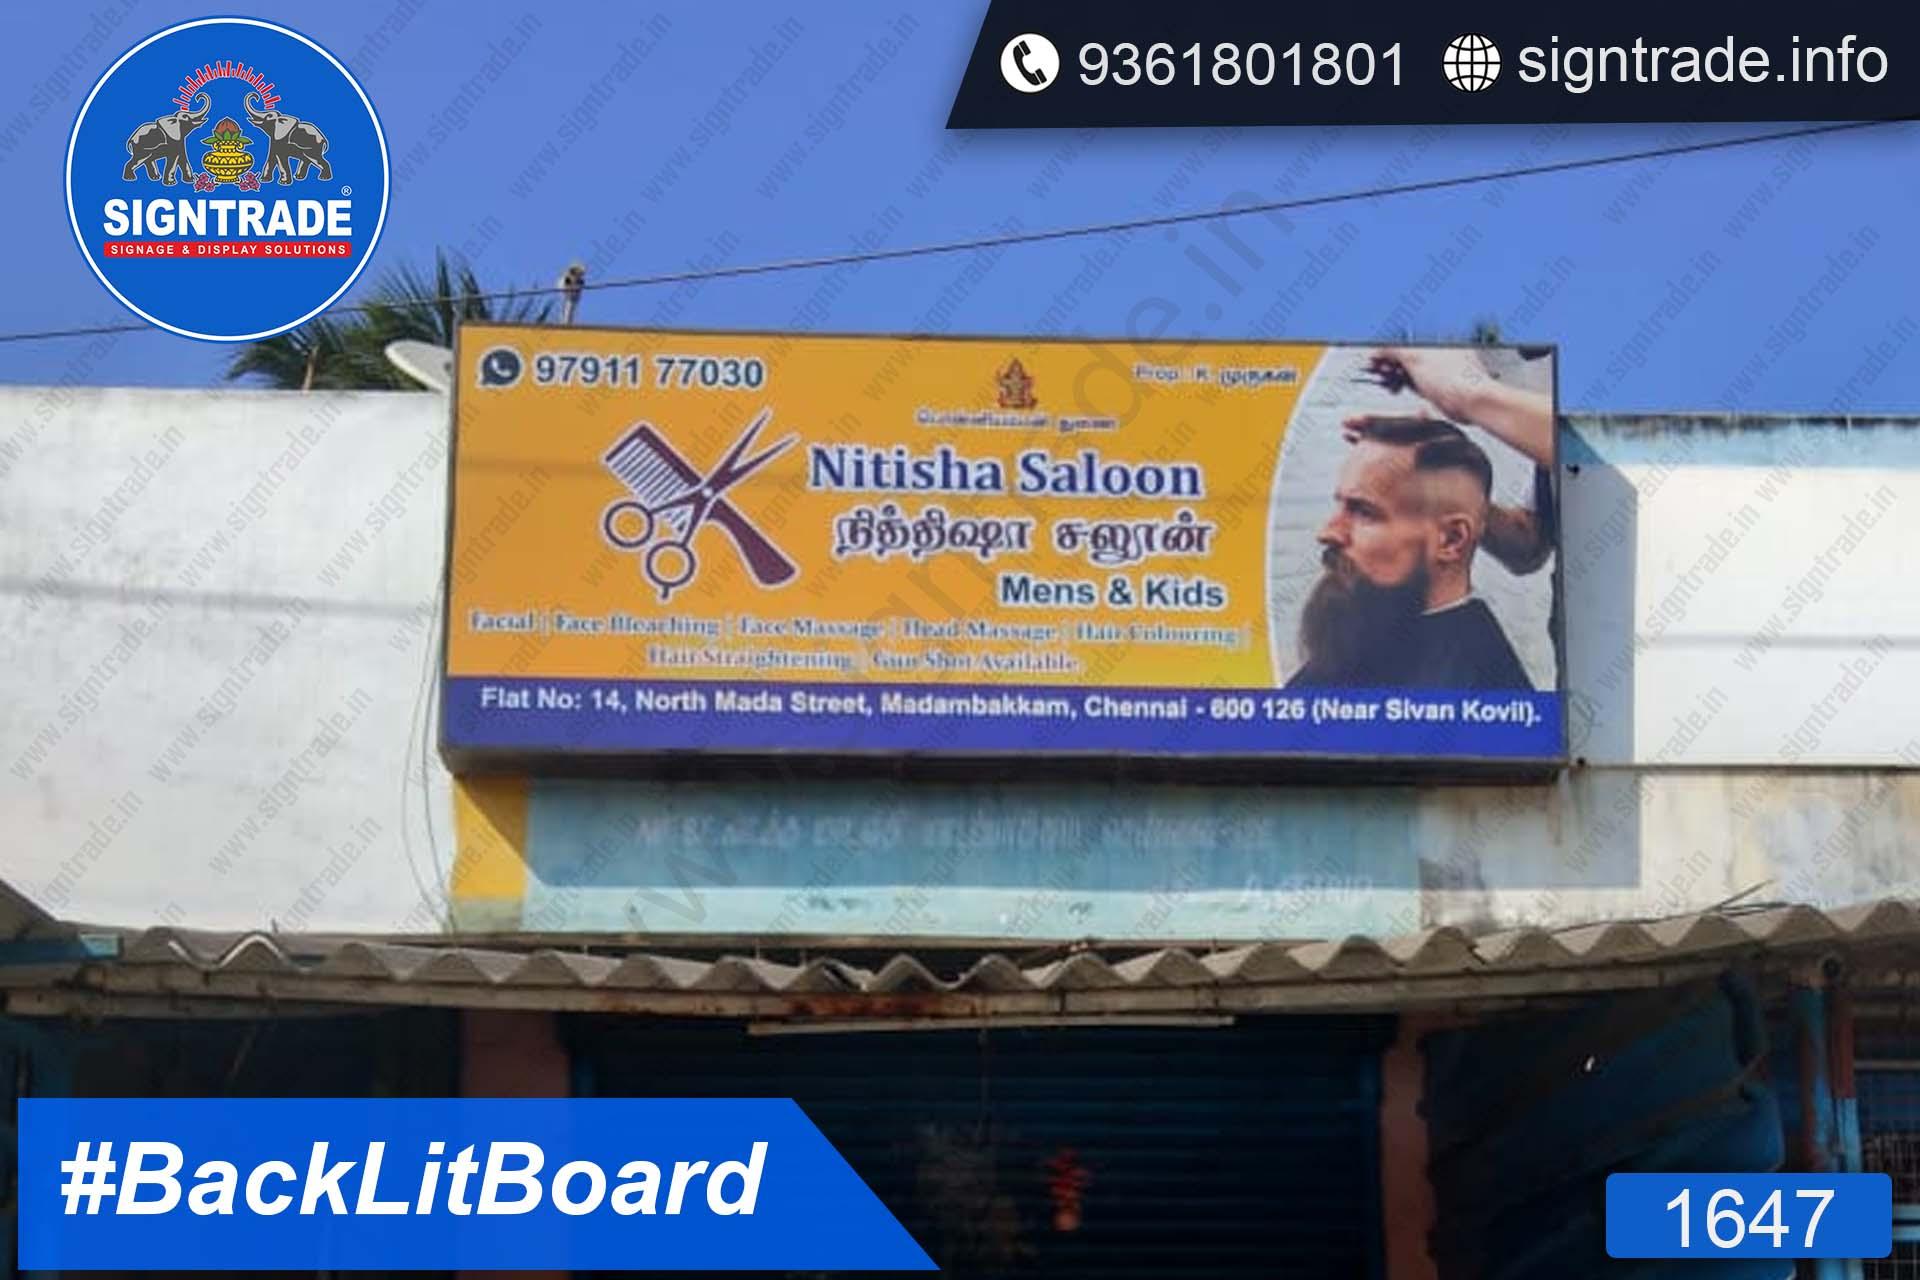 Nithisha Saloon, Madambakkam, Chennai - SIGNTRADE - Backlit Board Manufacturers in Chennai